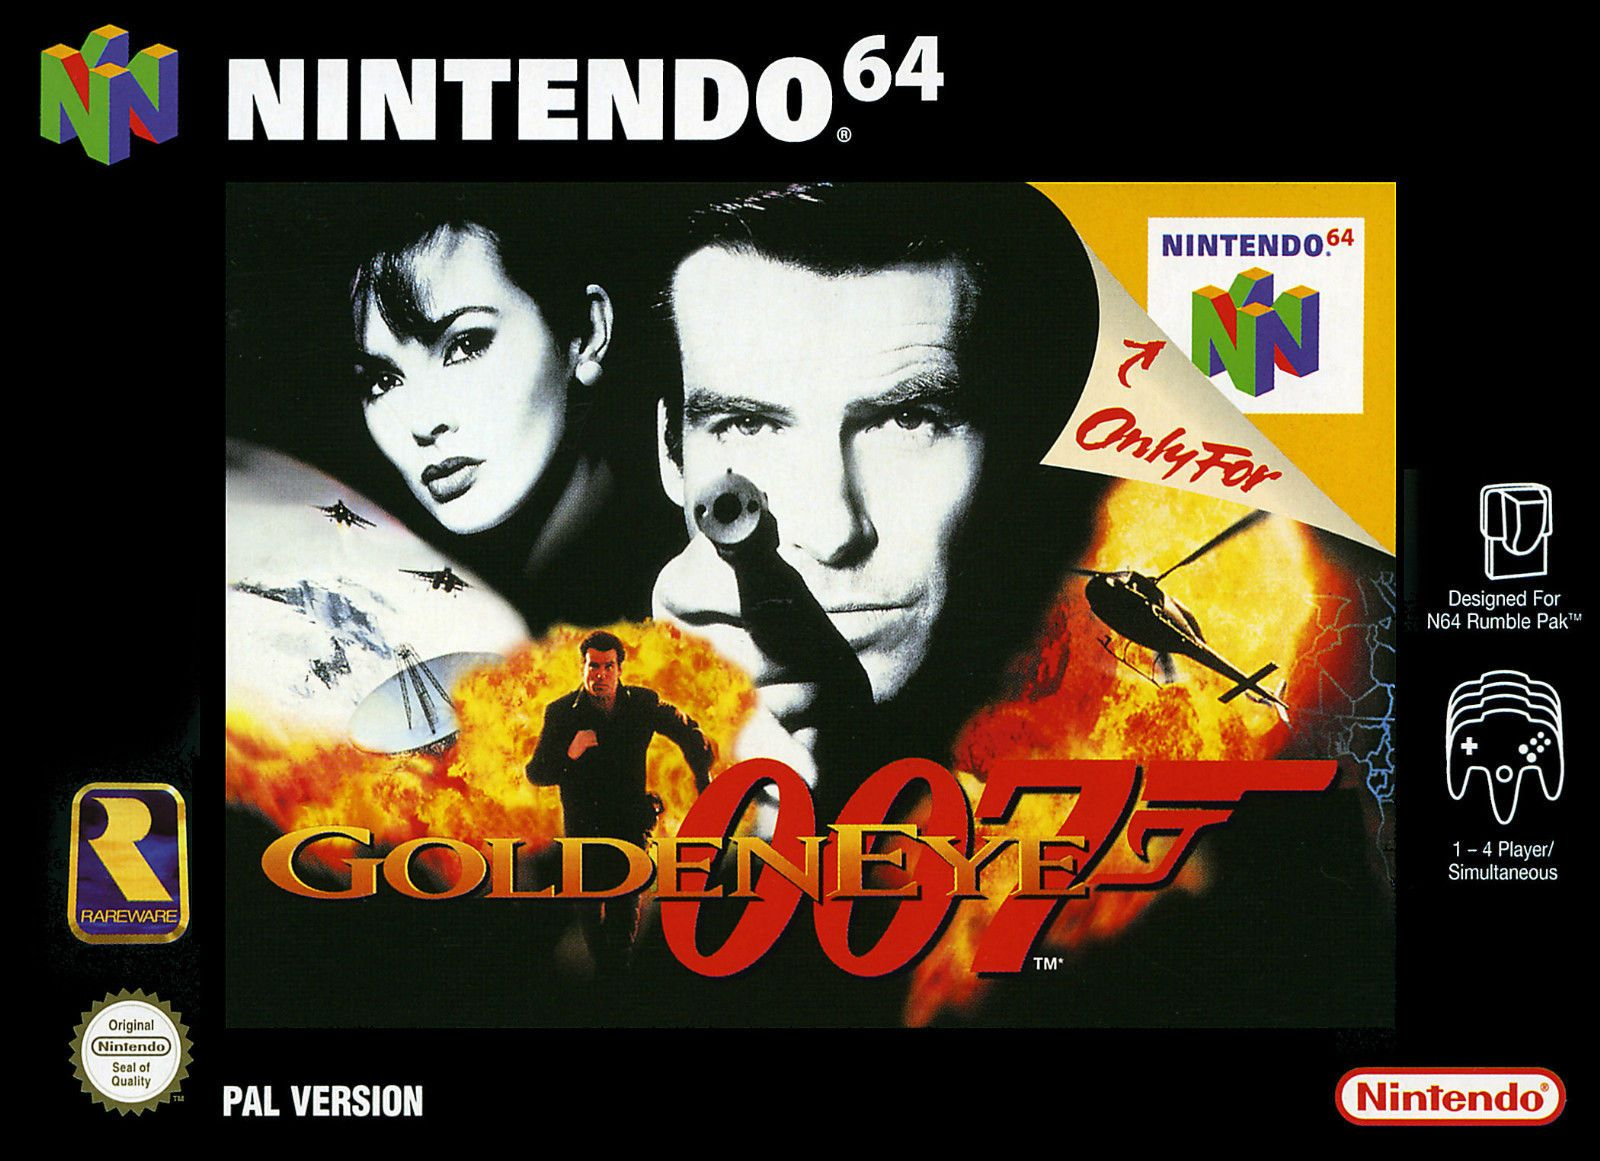 661741be8c8a53fb9369d7ba1e45bf8f 20 Hidden Levels in Video Games